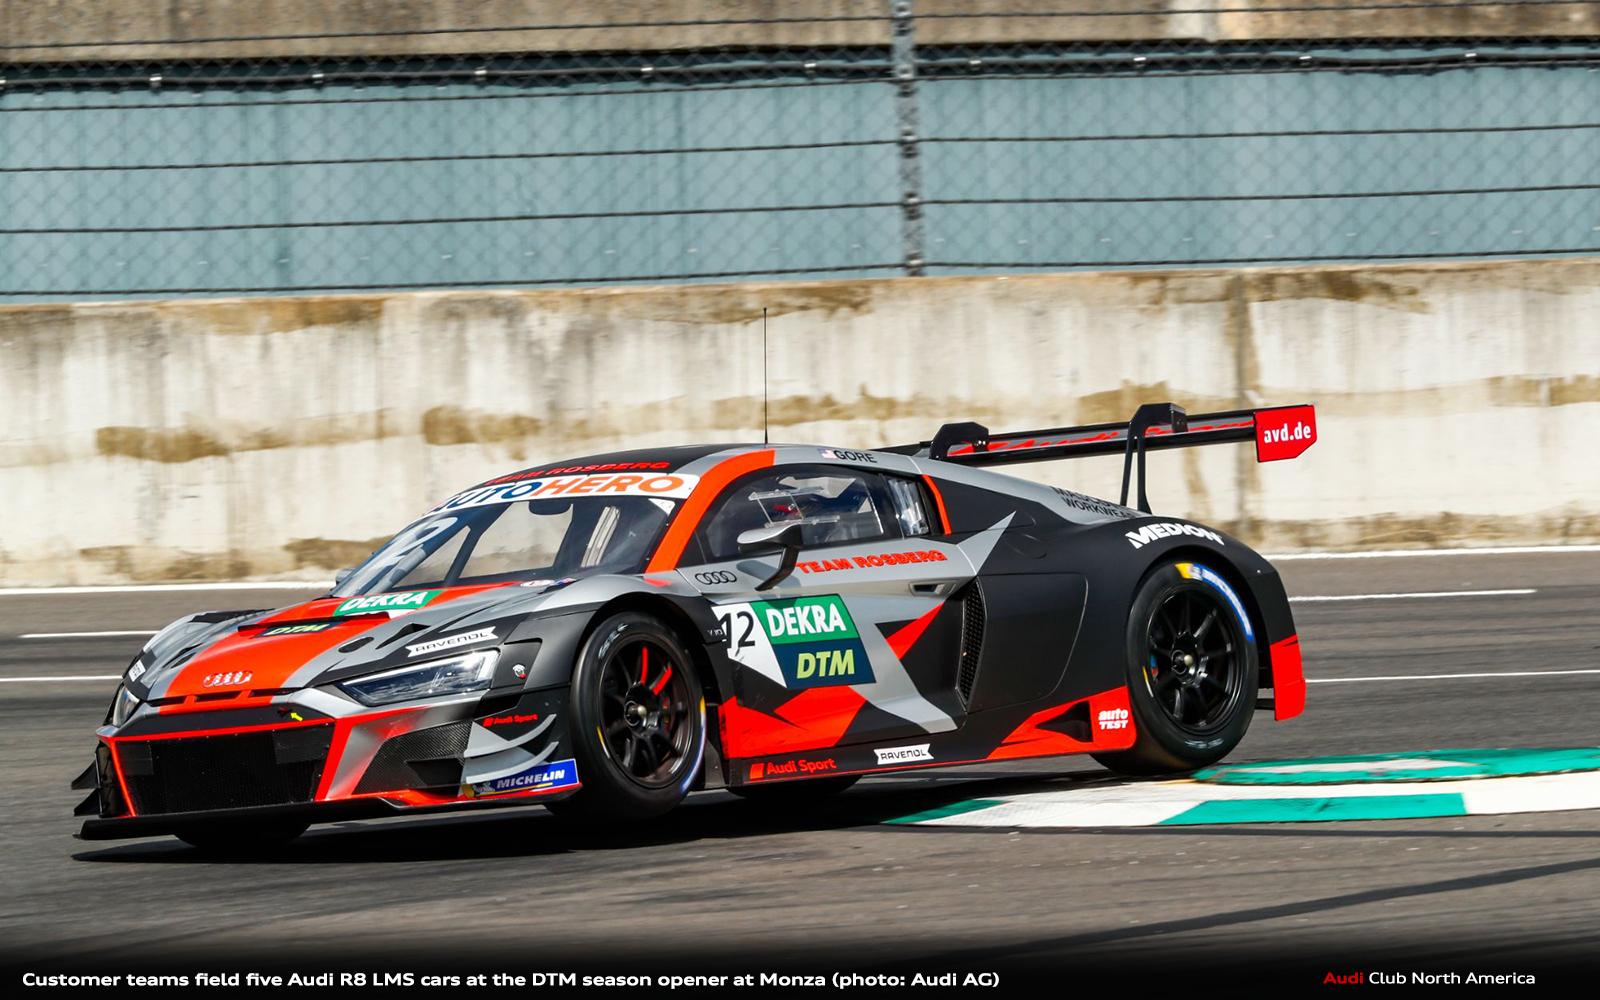 Customer Teams Field Five Audi R8 LMS Cars at the DTM Season Opener at Monza